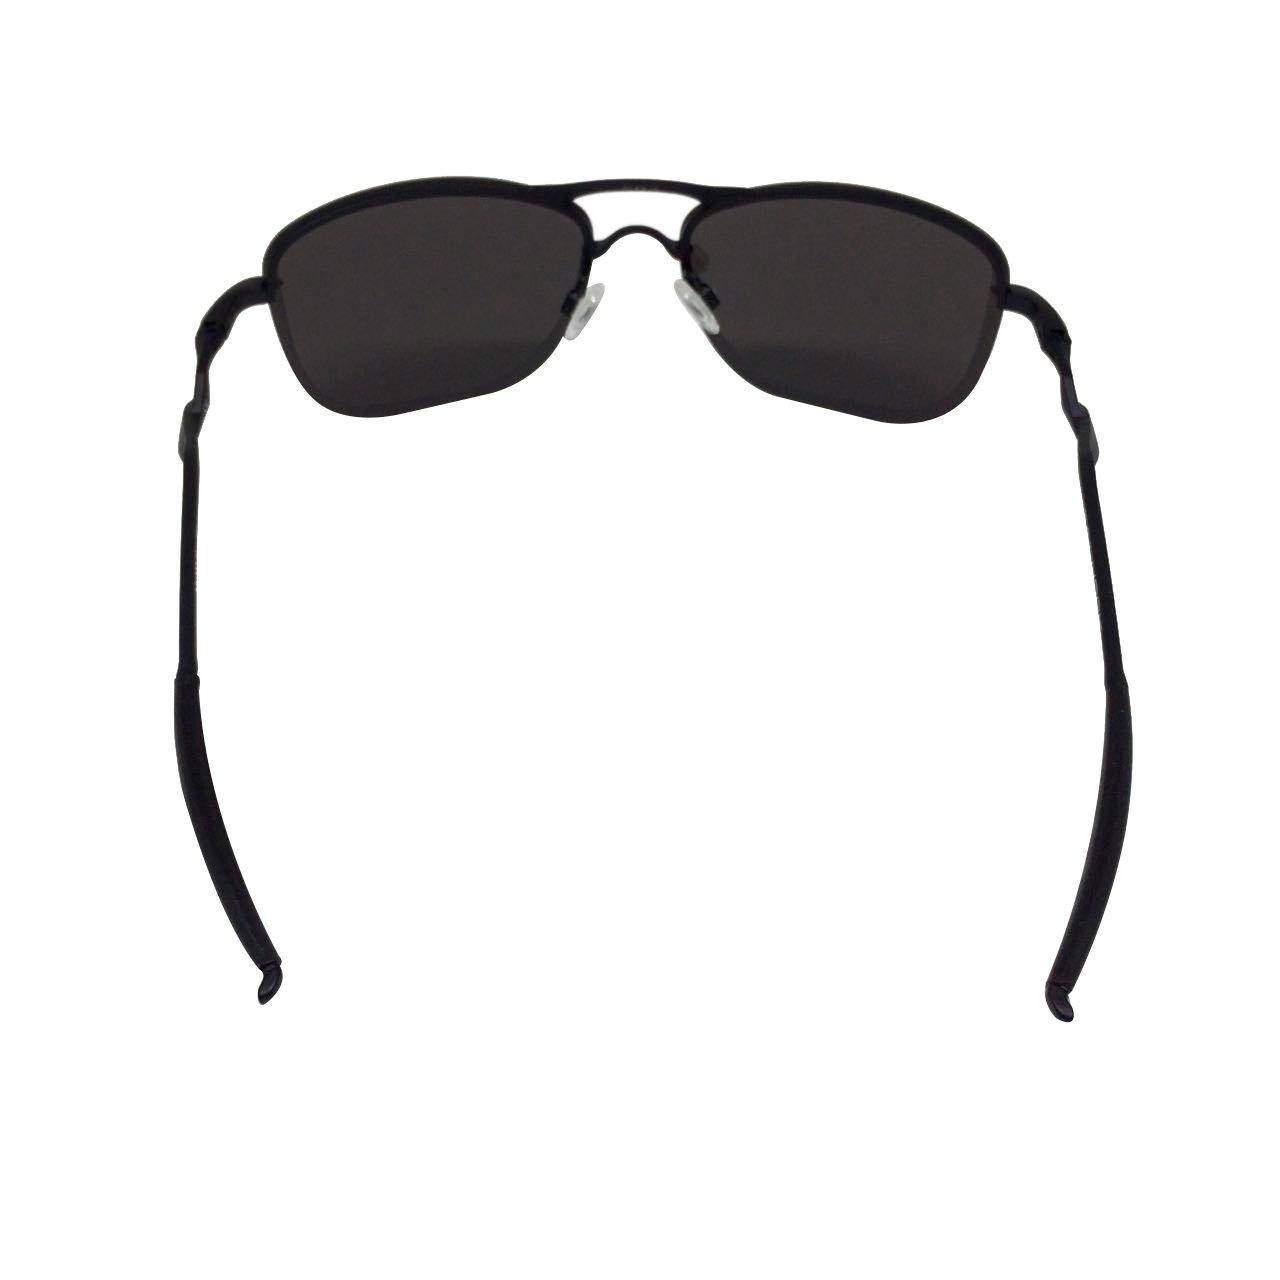 Óculos Solar Oakley Tailhook roxo – Sanfer Acessórios d52a17c44f